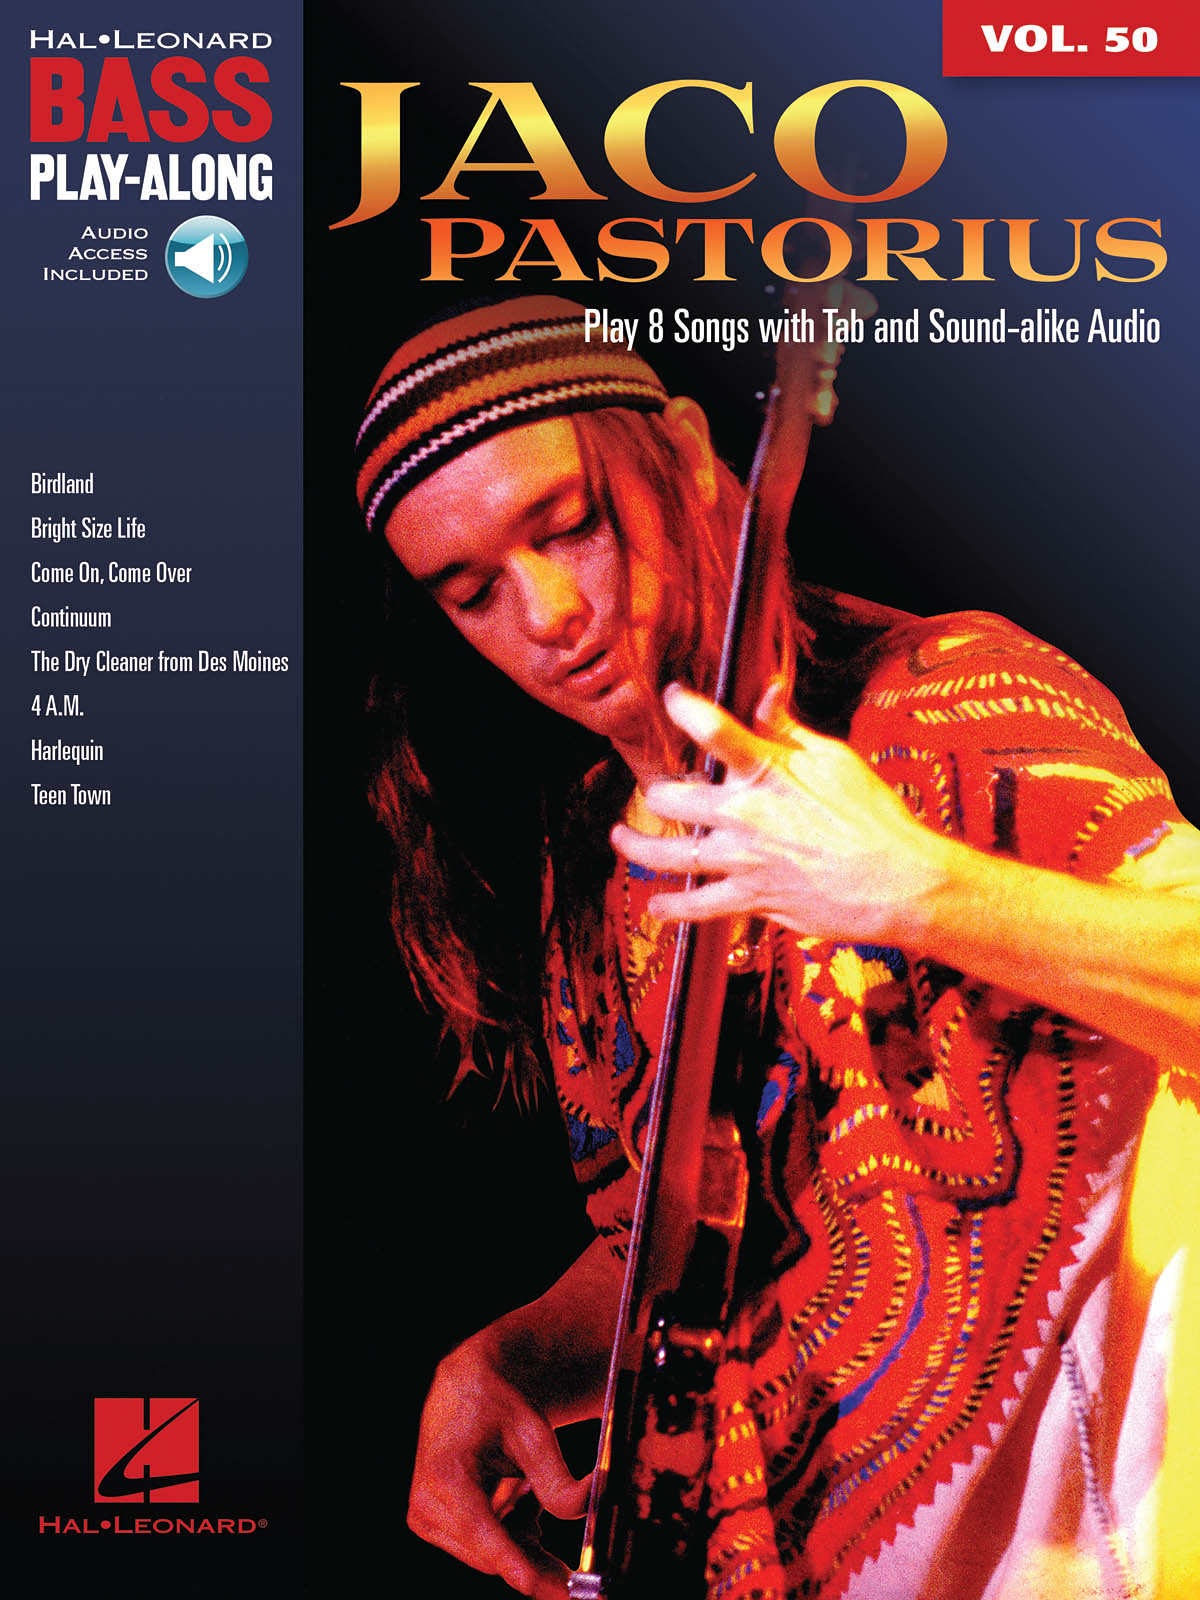 Jaco Pastorius: Bass Play-Along Volume 50: Jaco Pastorius: Bass Guitar Solo: